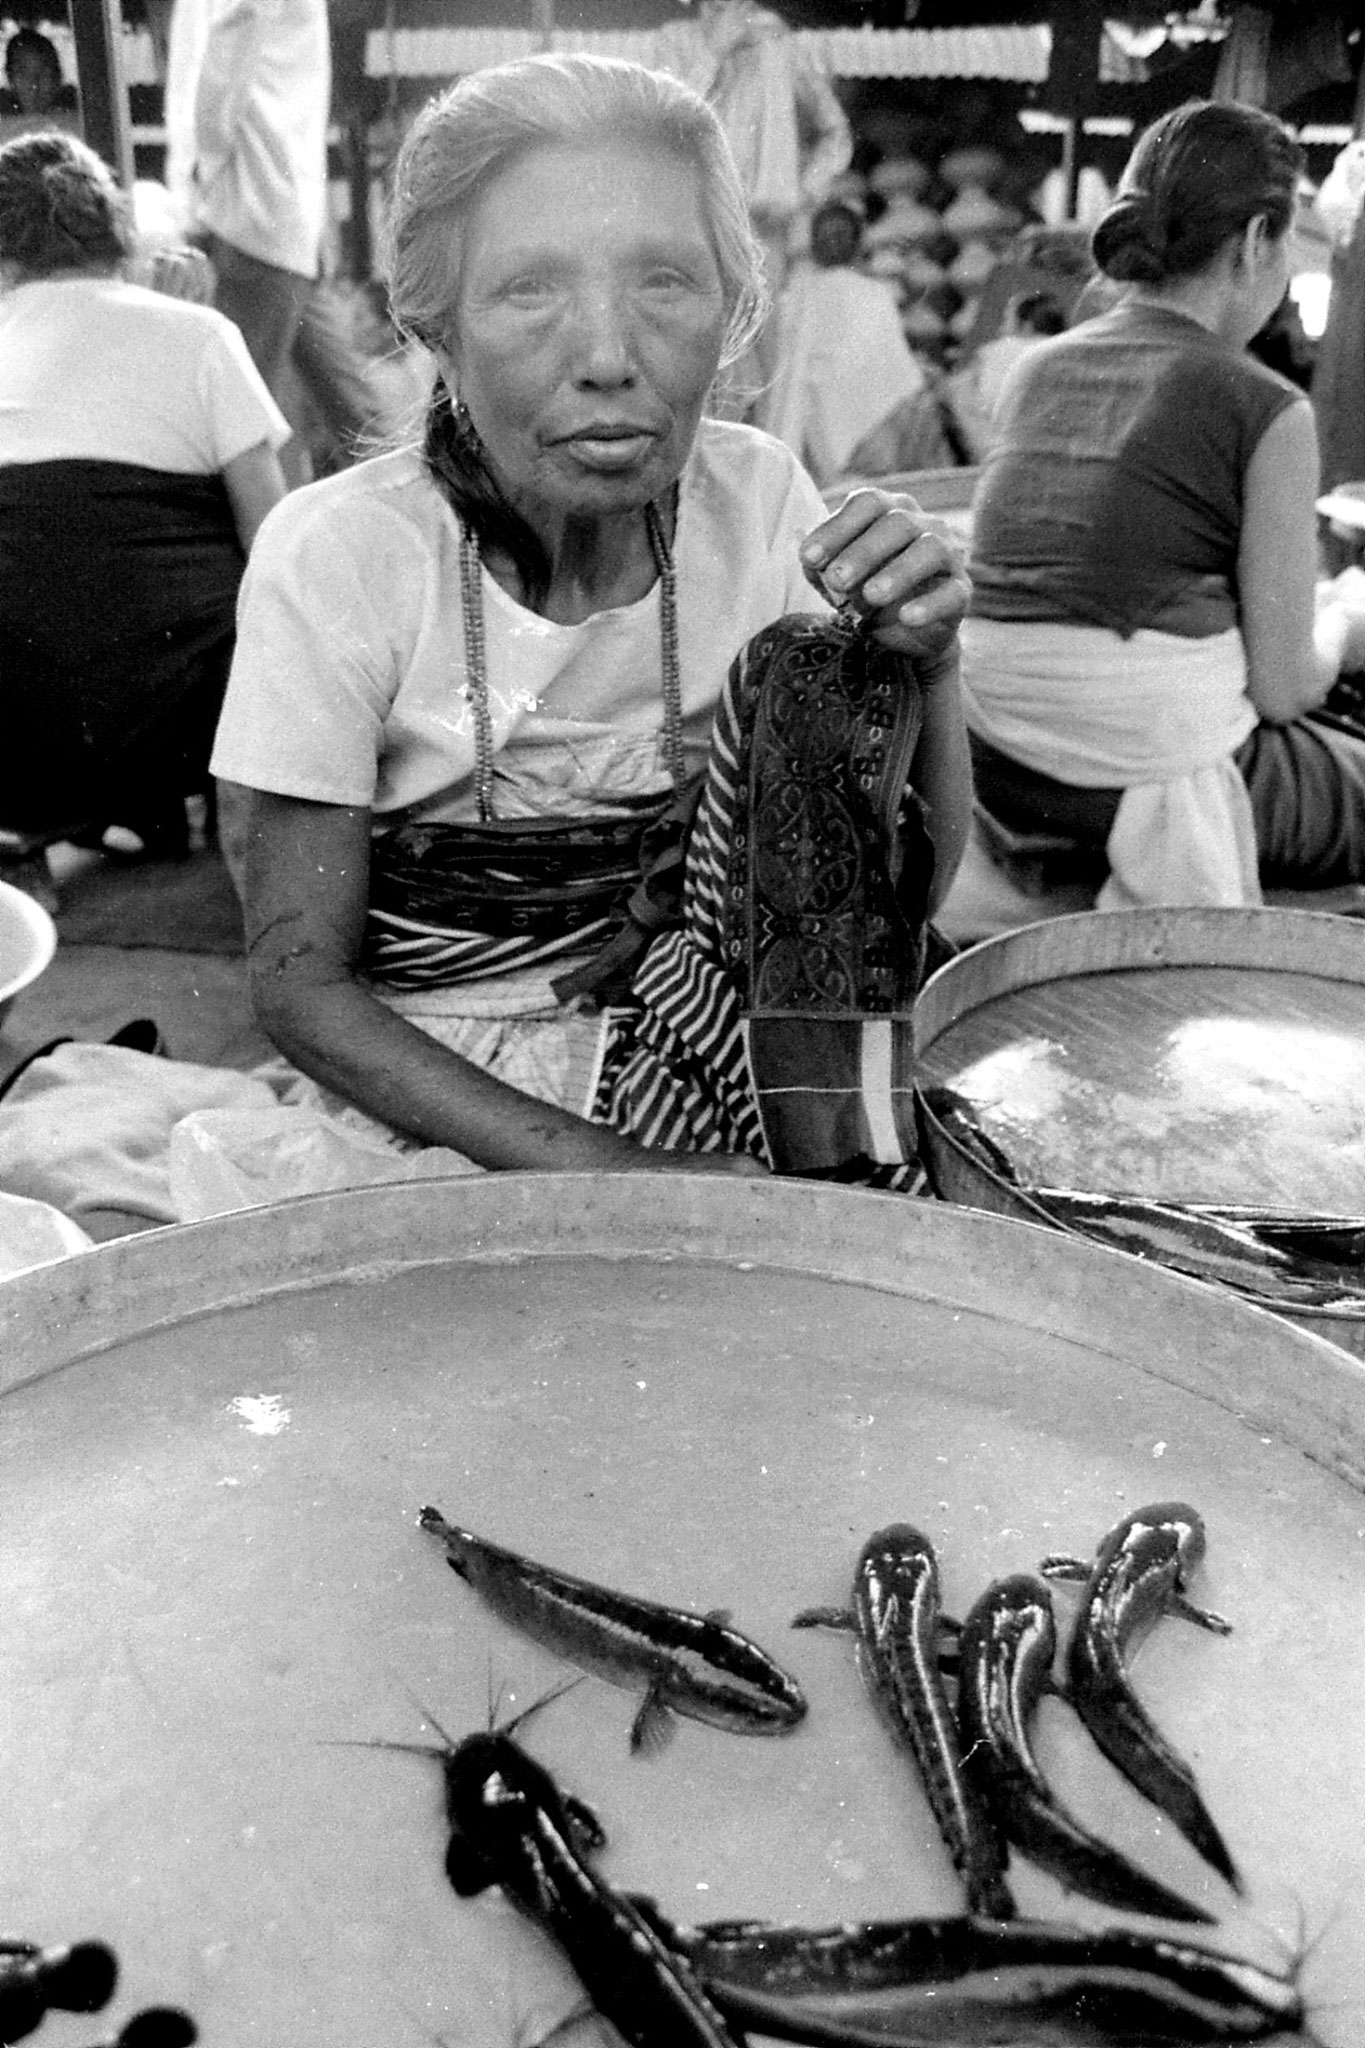 17/4/1990: 8: Imphal women's market